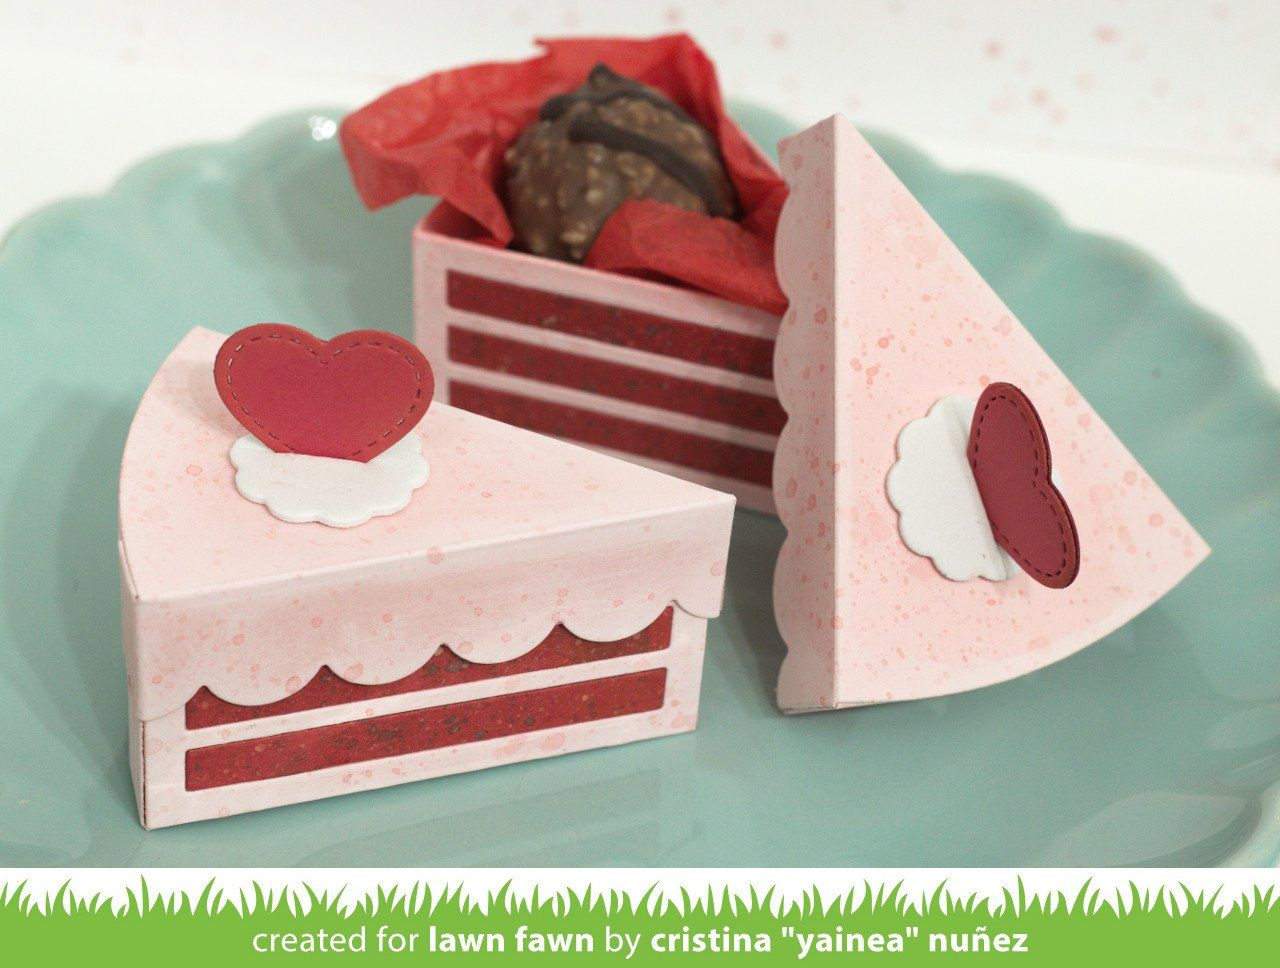 Cake slice box cake slice boxes lawn fawn valentine cake